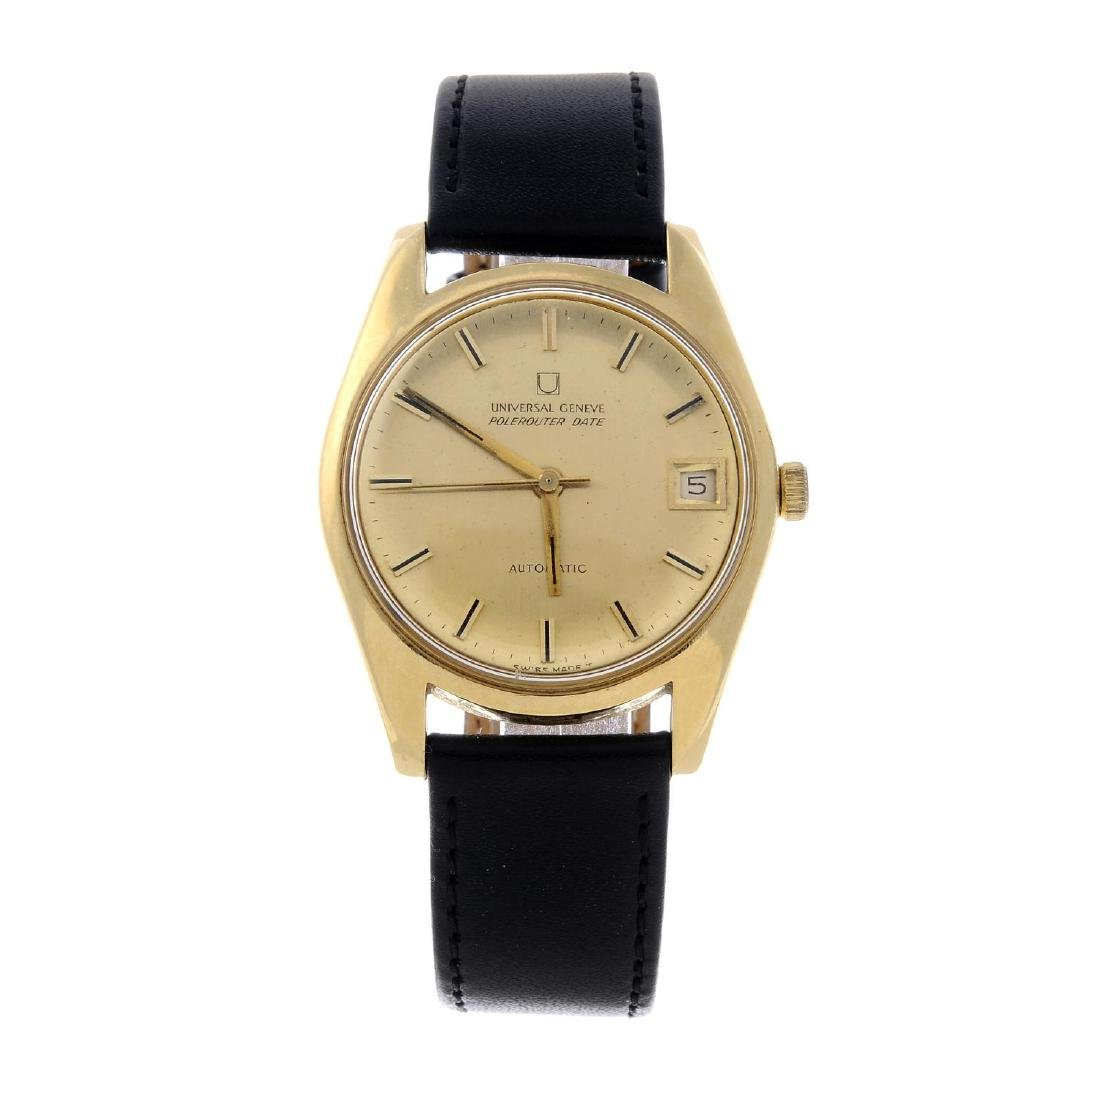 UNIVERSAL GENEVE - a gentleman's Polerouter Date wrist